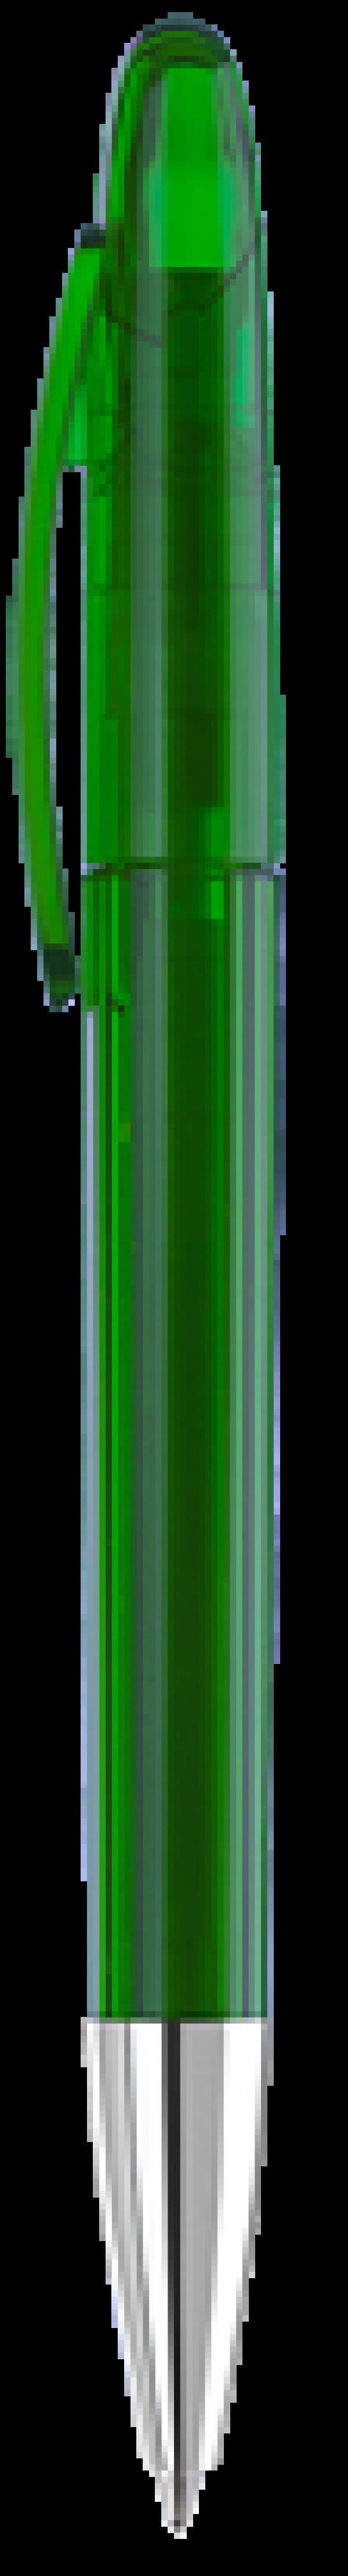 Шариковая ручка g 0-0056 T-SI ICON transparent